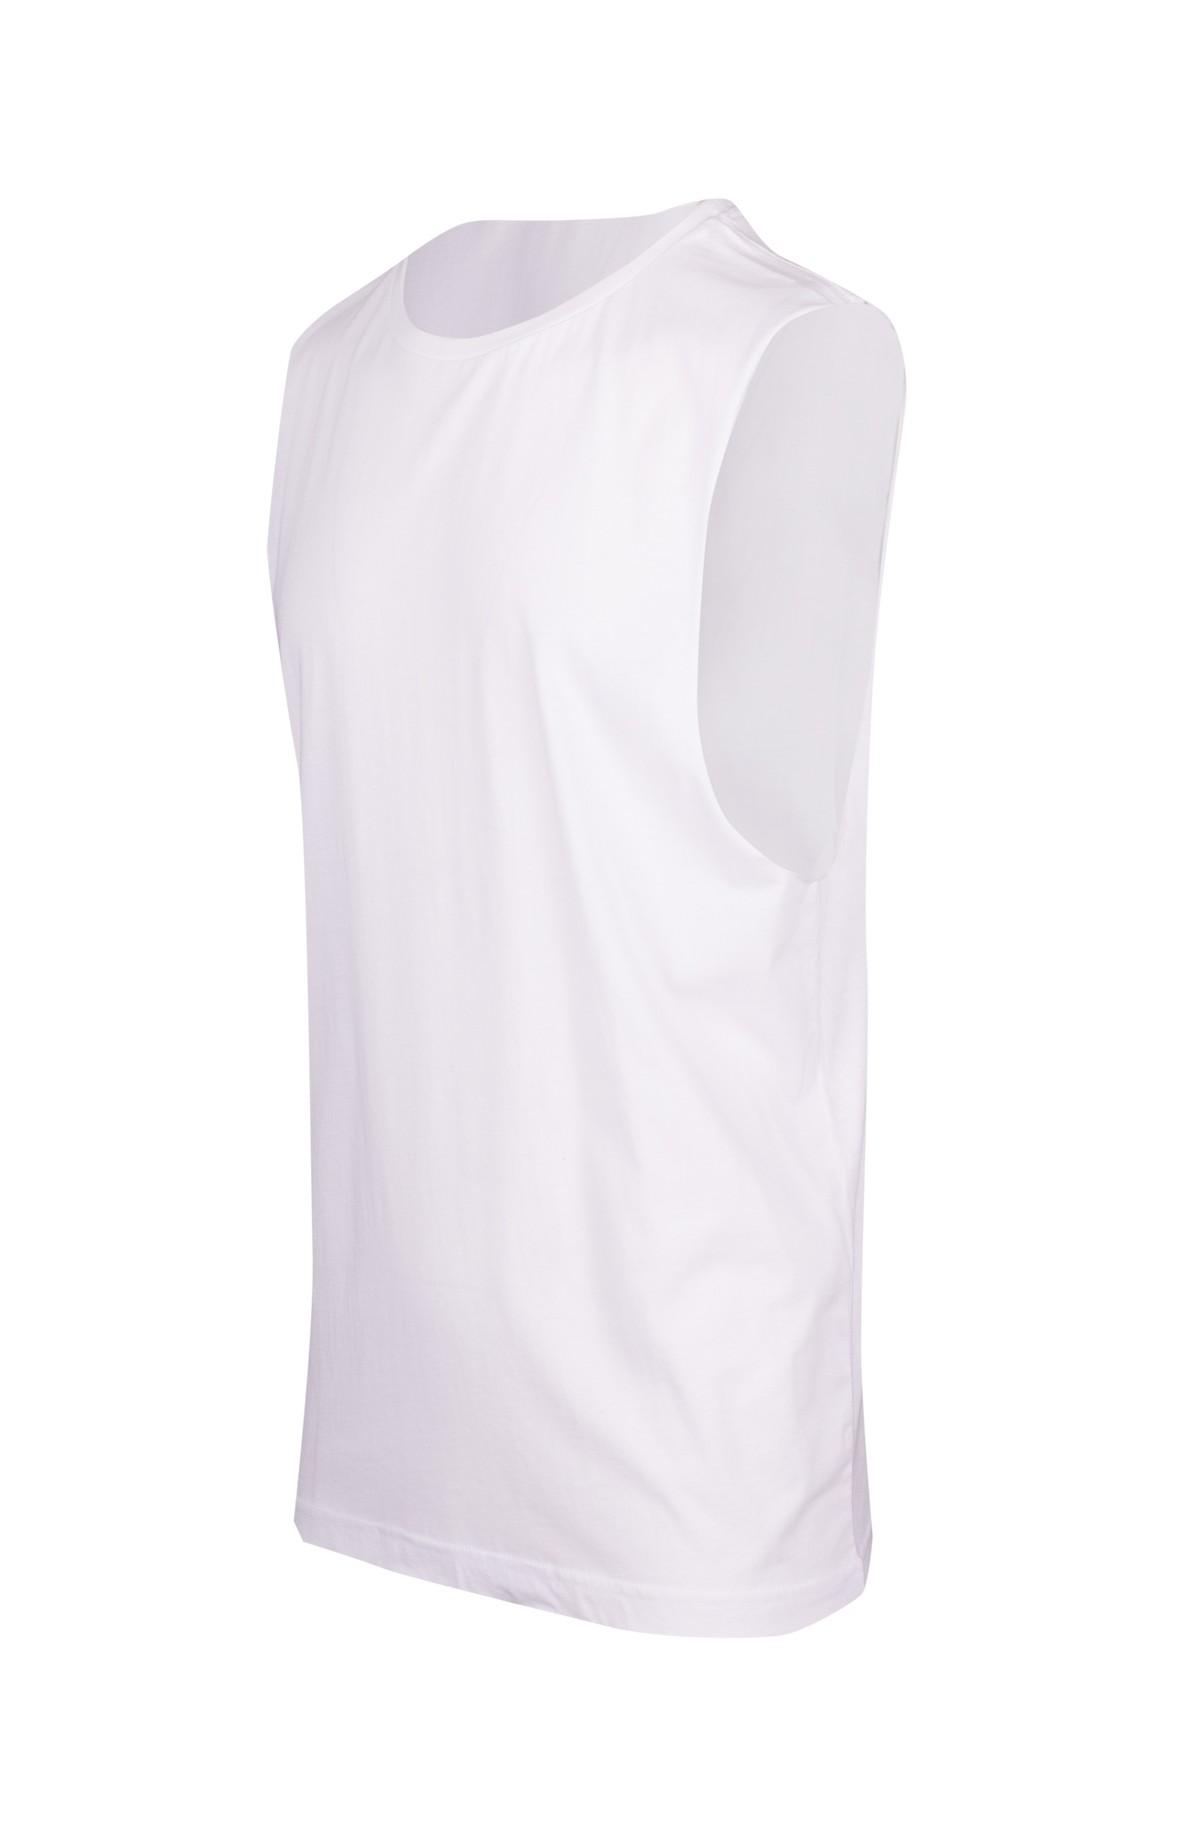 160gsm 100% combed cotton sleeveless tee